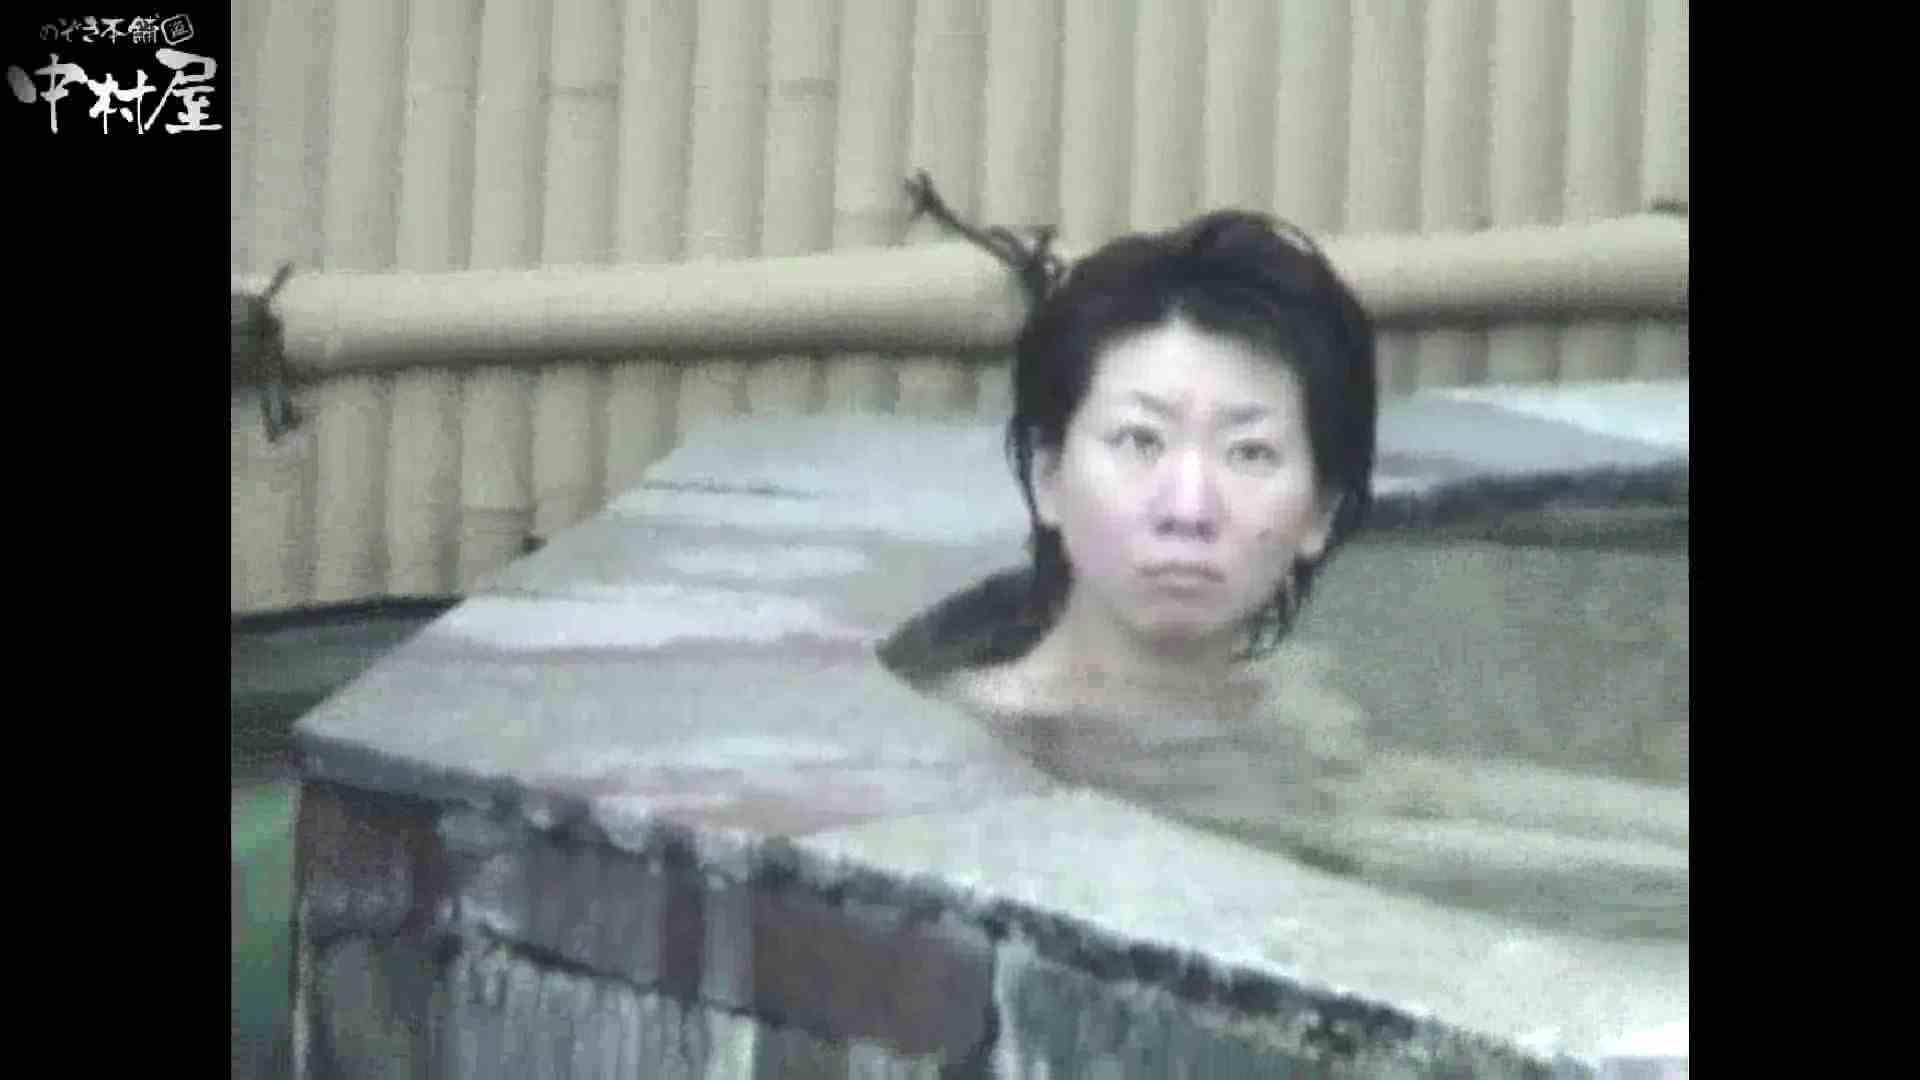 Aquaな露天風呂Vol.880潜入盗撮露天風呂十六判湯 其の三 潜入画像 | 露天  78画像 43